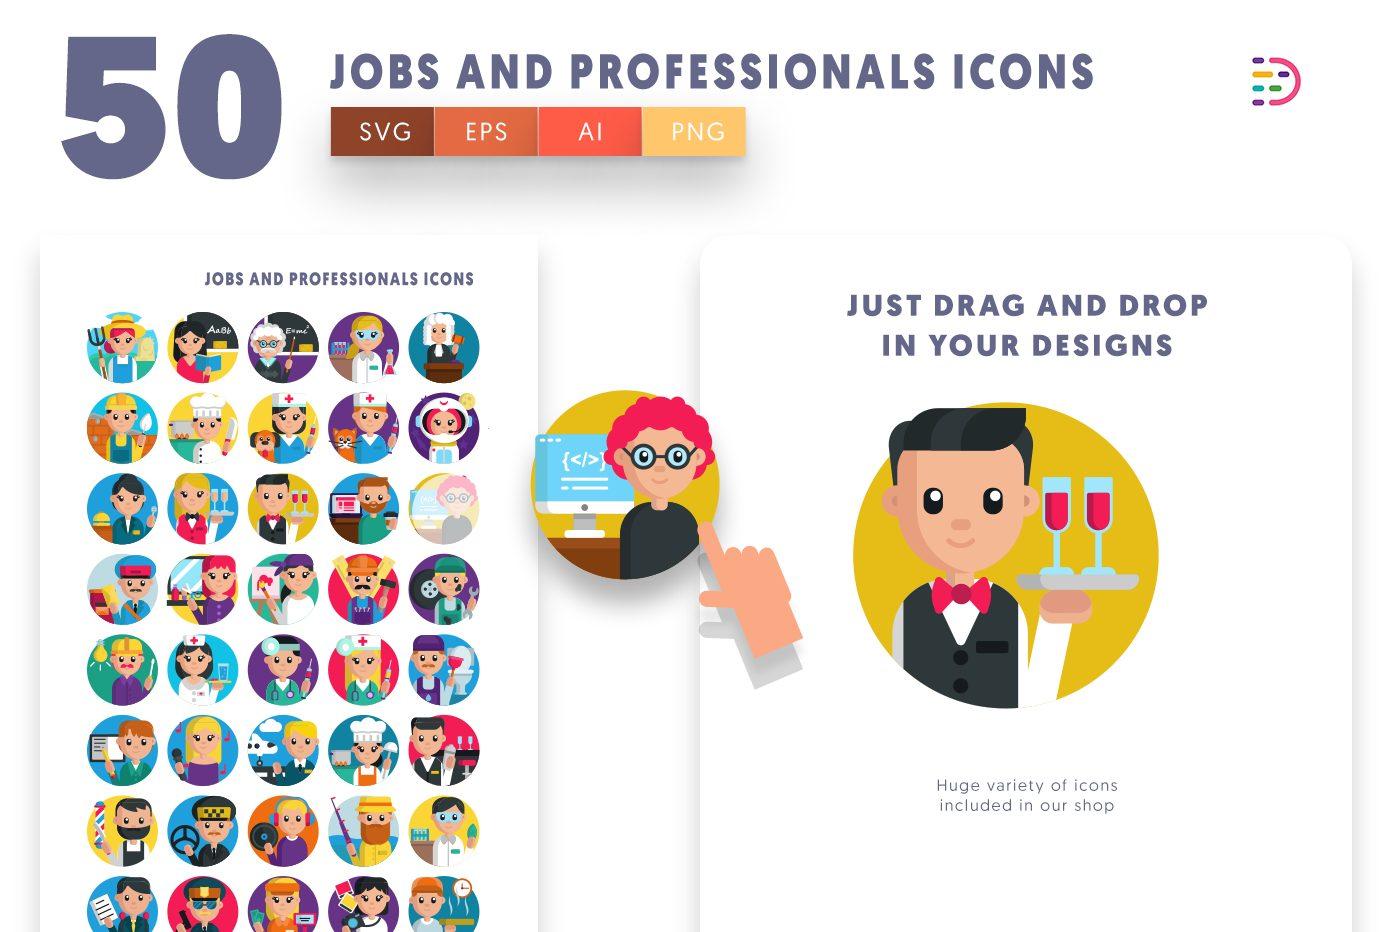 Drag and drop vector 50 Job and Professionals Icons